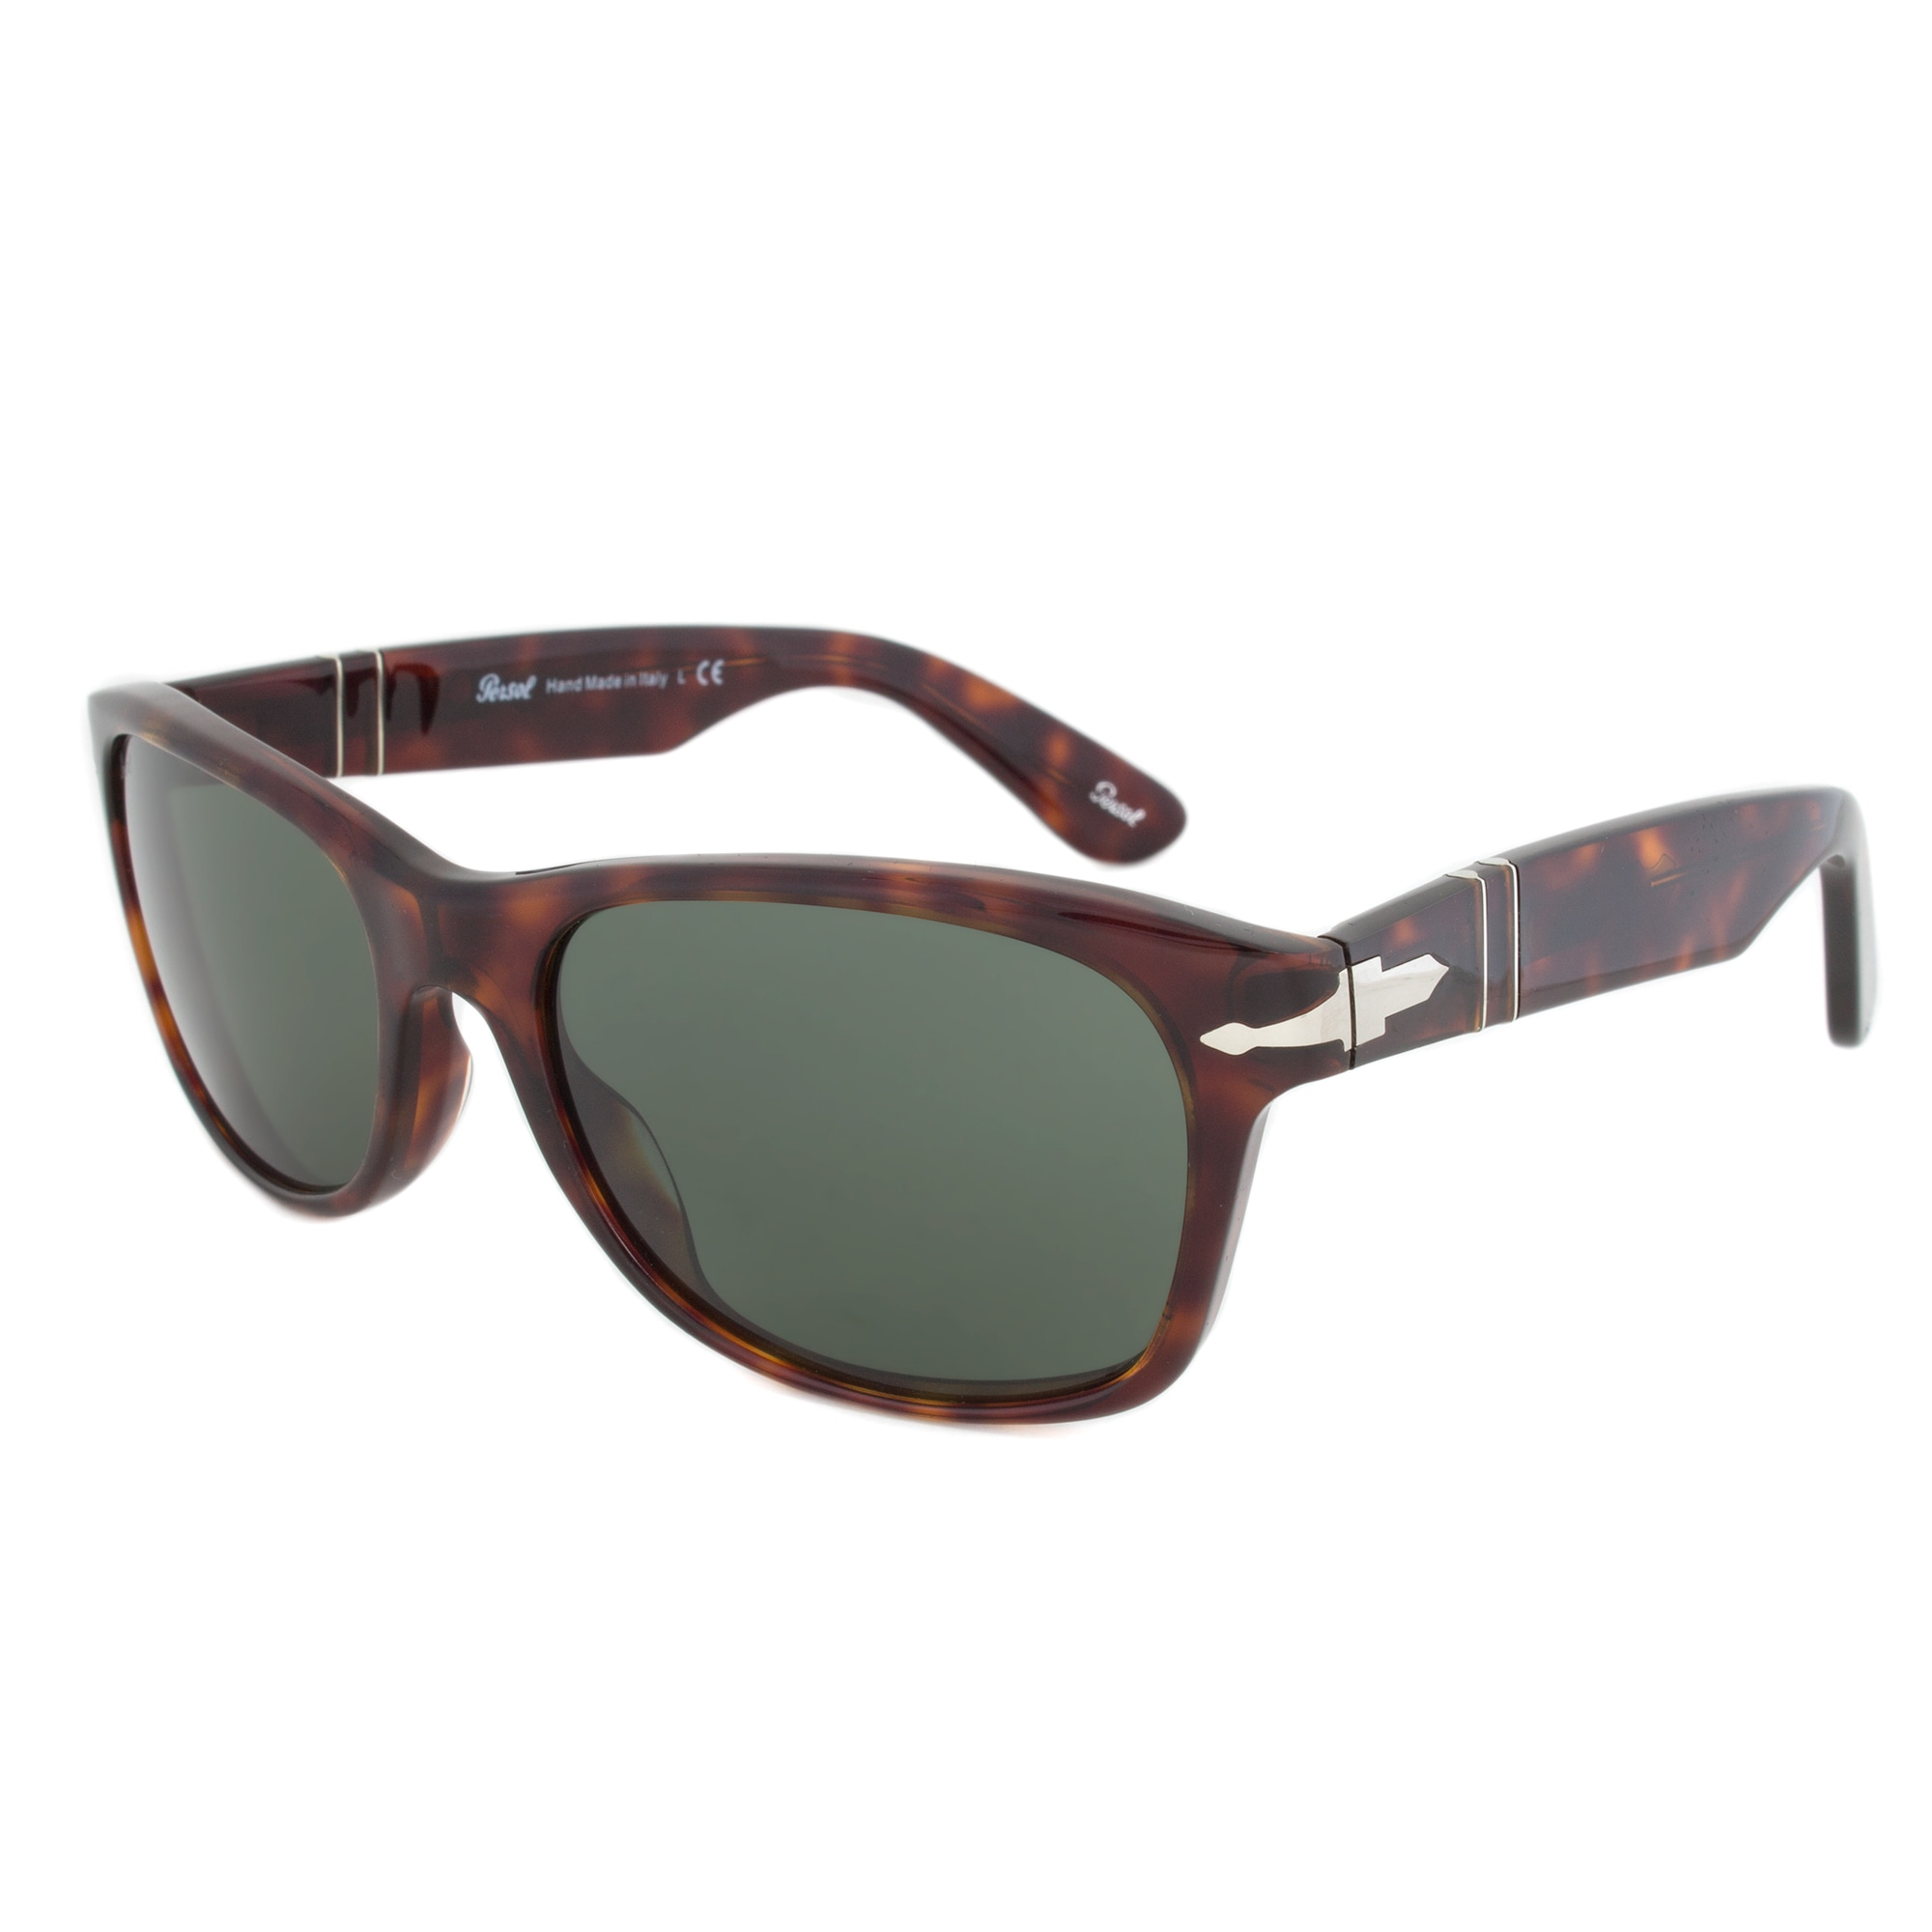 423825bb02 Shop Persol Men s PO2953S Plastic Square Sunglasses - Tortoise ...